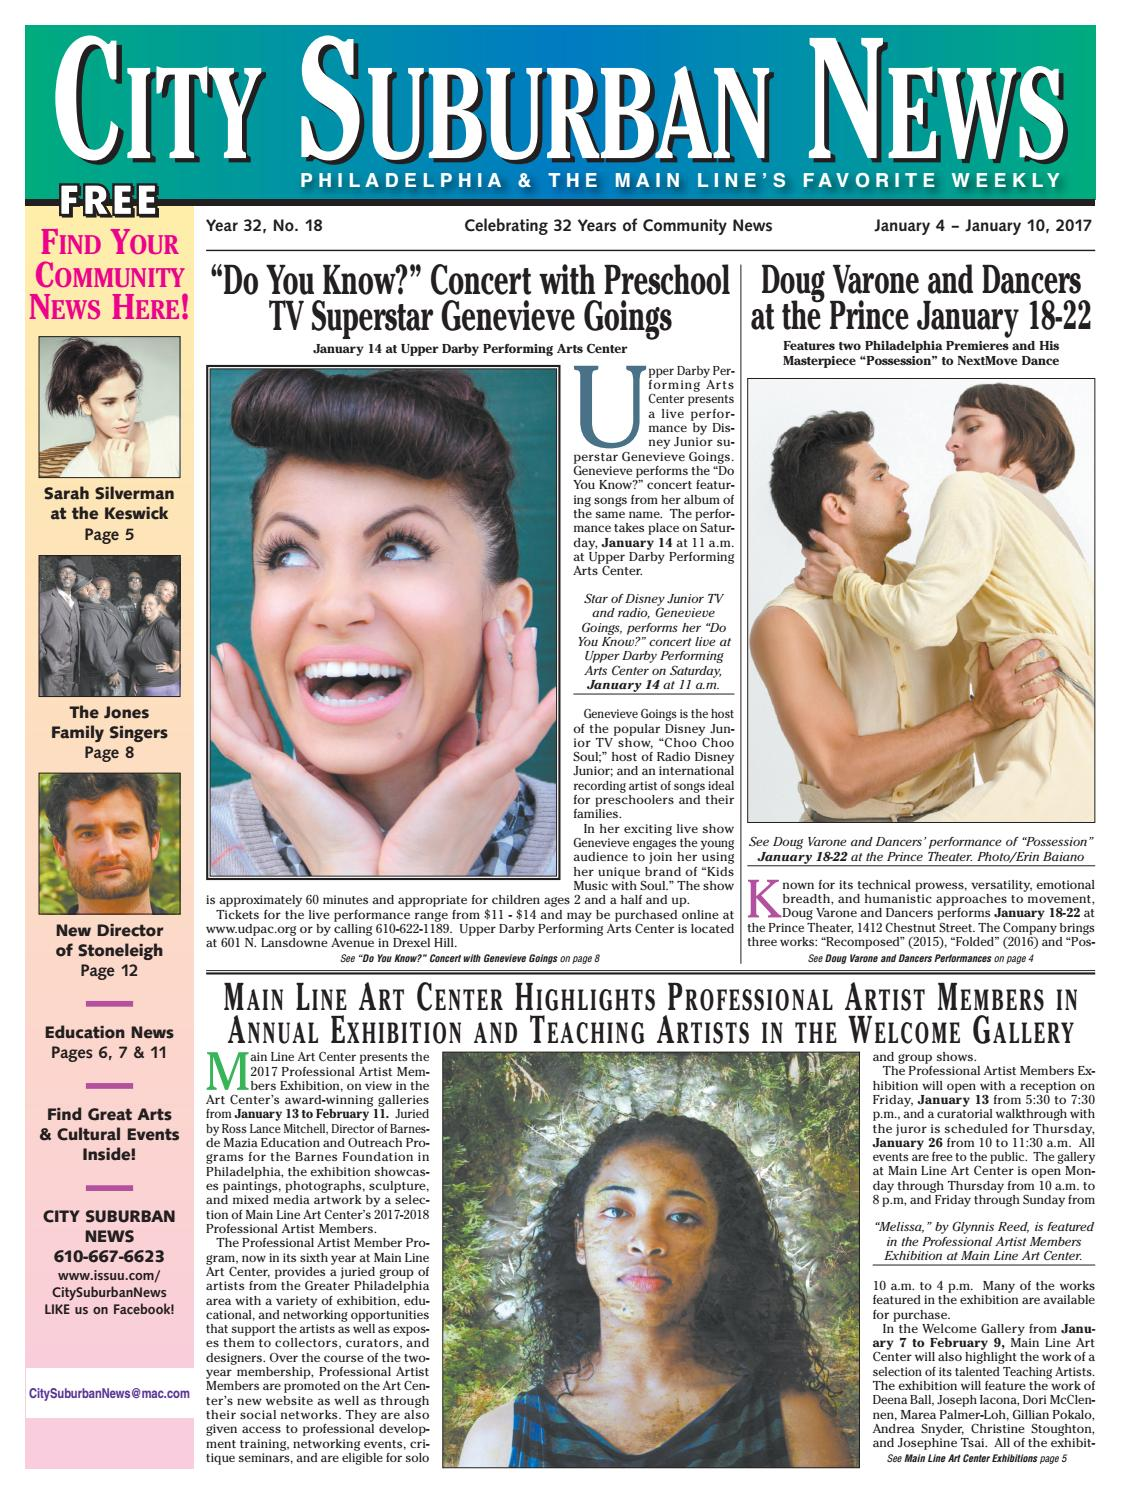 City Suburban News 1_4_17 issue by City Suburban News - issuu